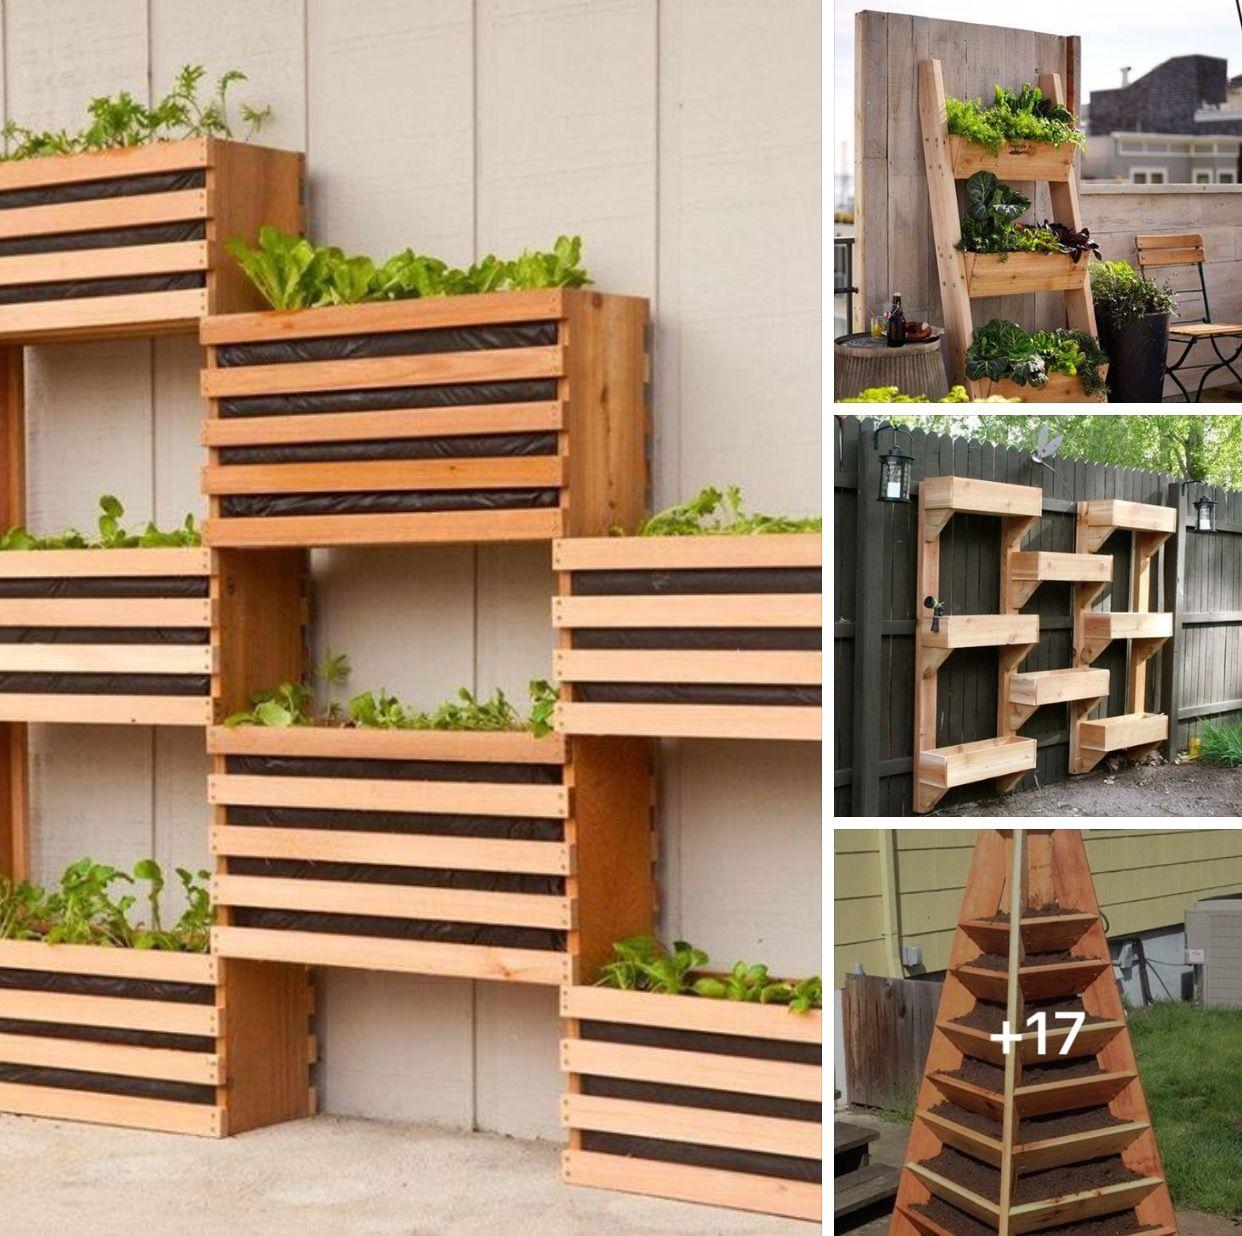 Pin by A Webb on ideas | Vertical garden diy, Vertical ...